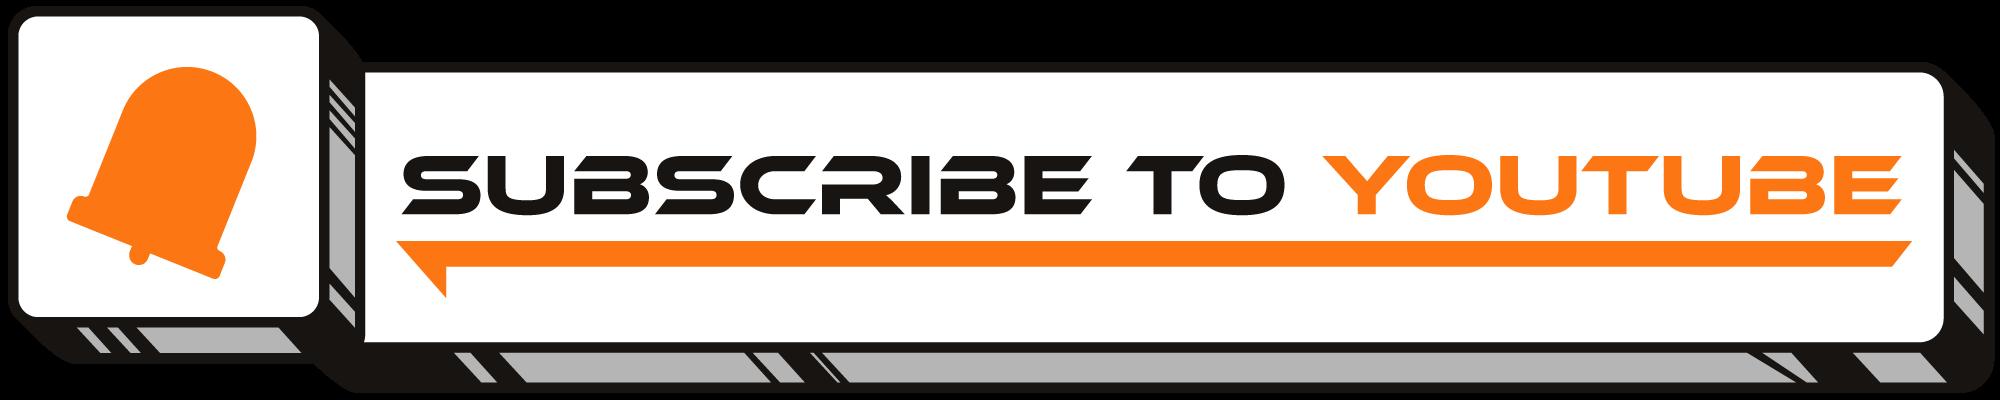 subcribe_banner